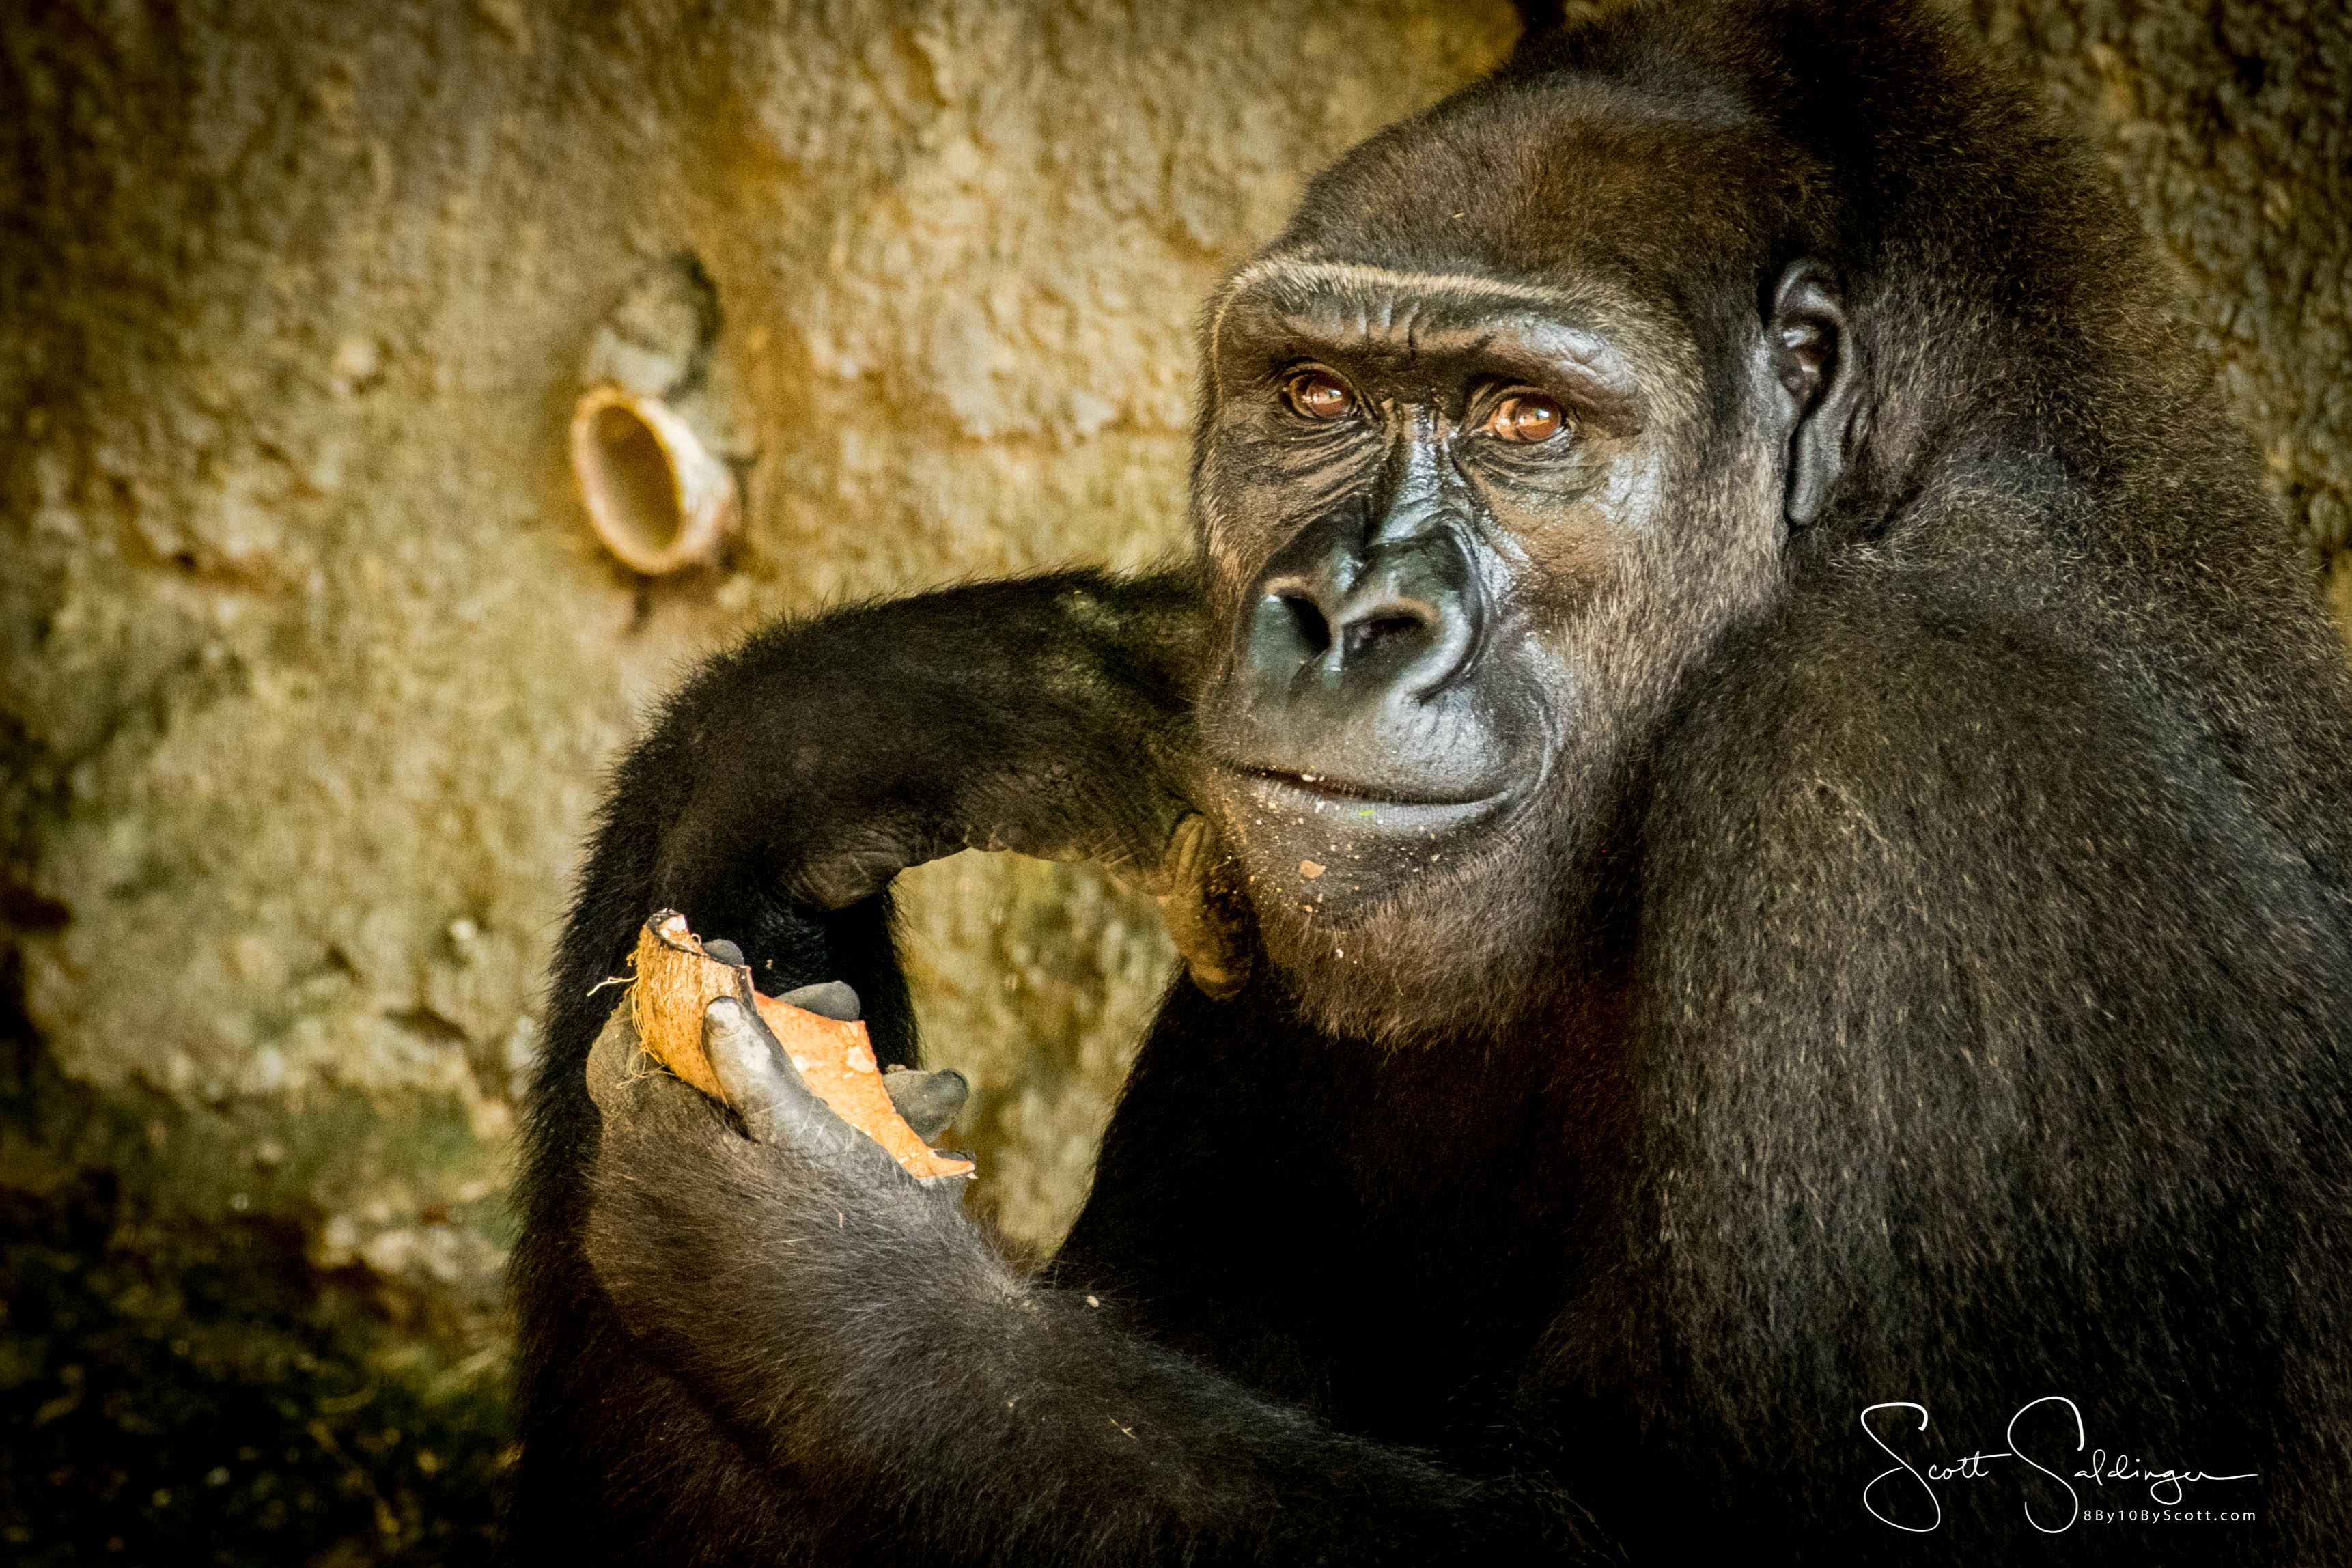 Apes-5724